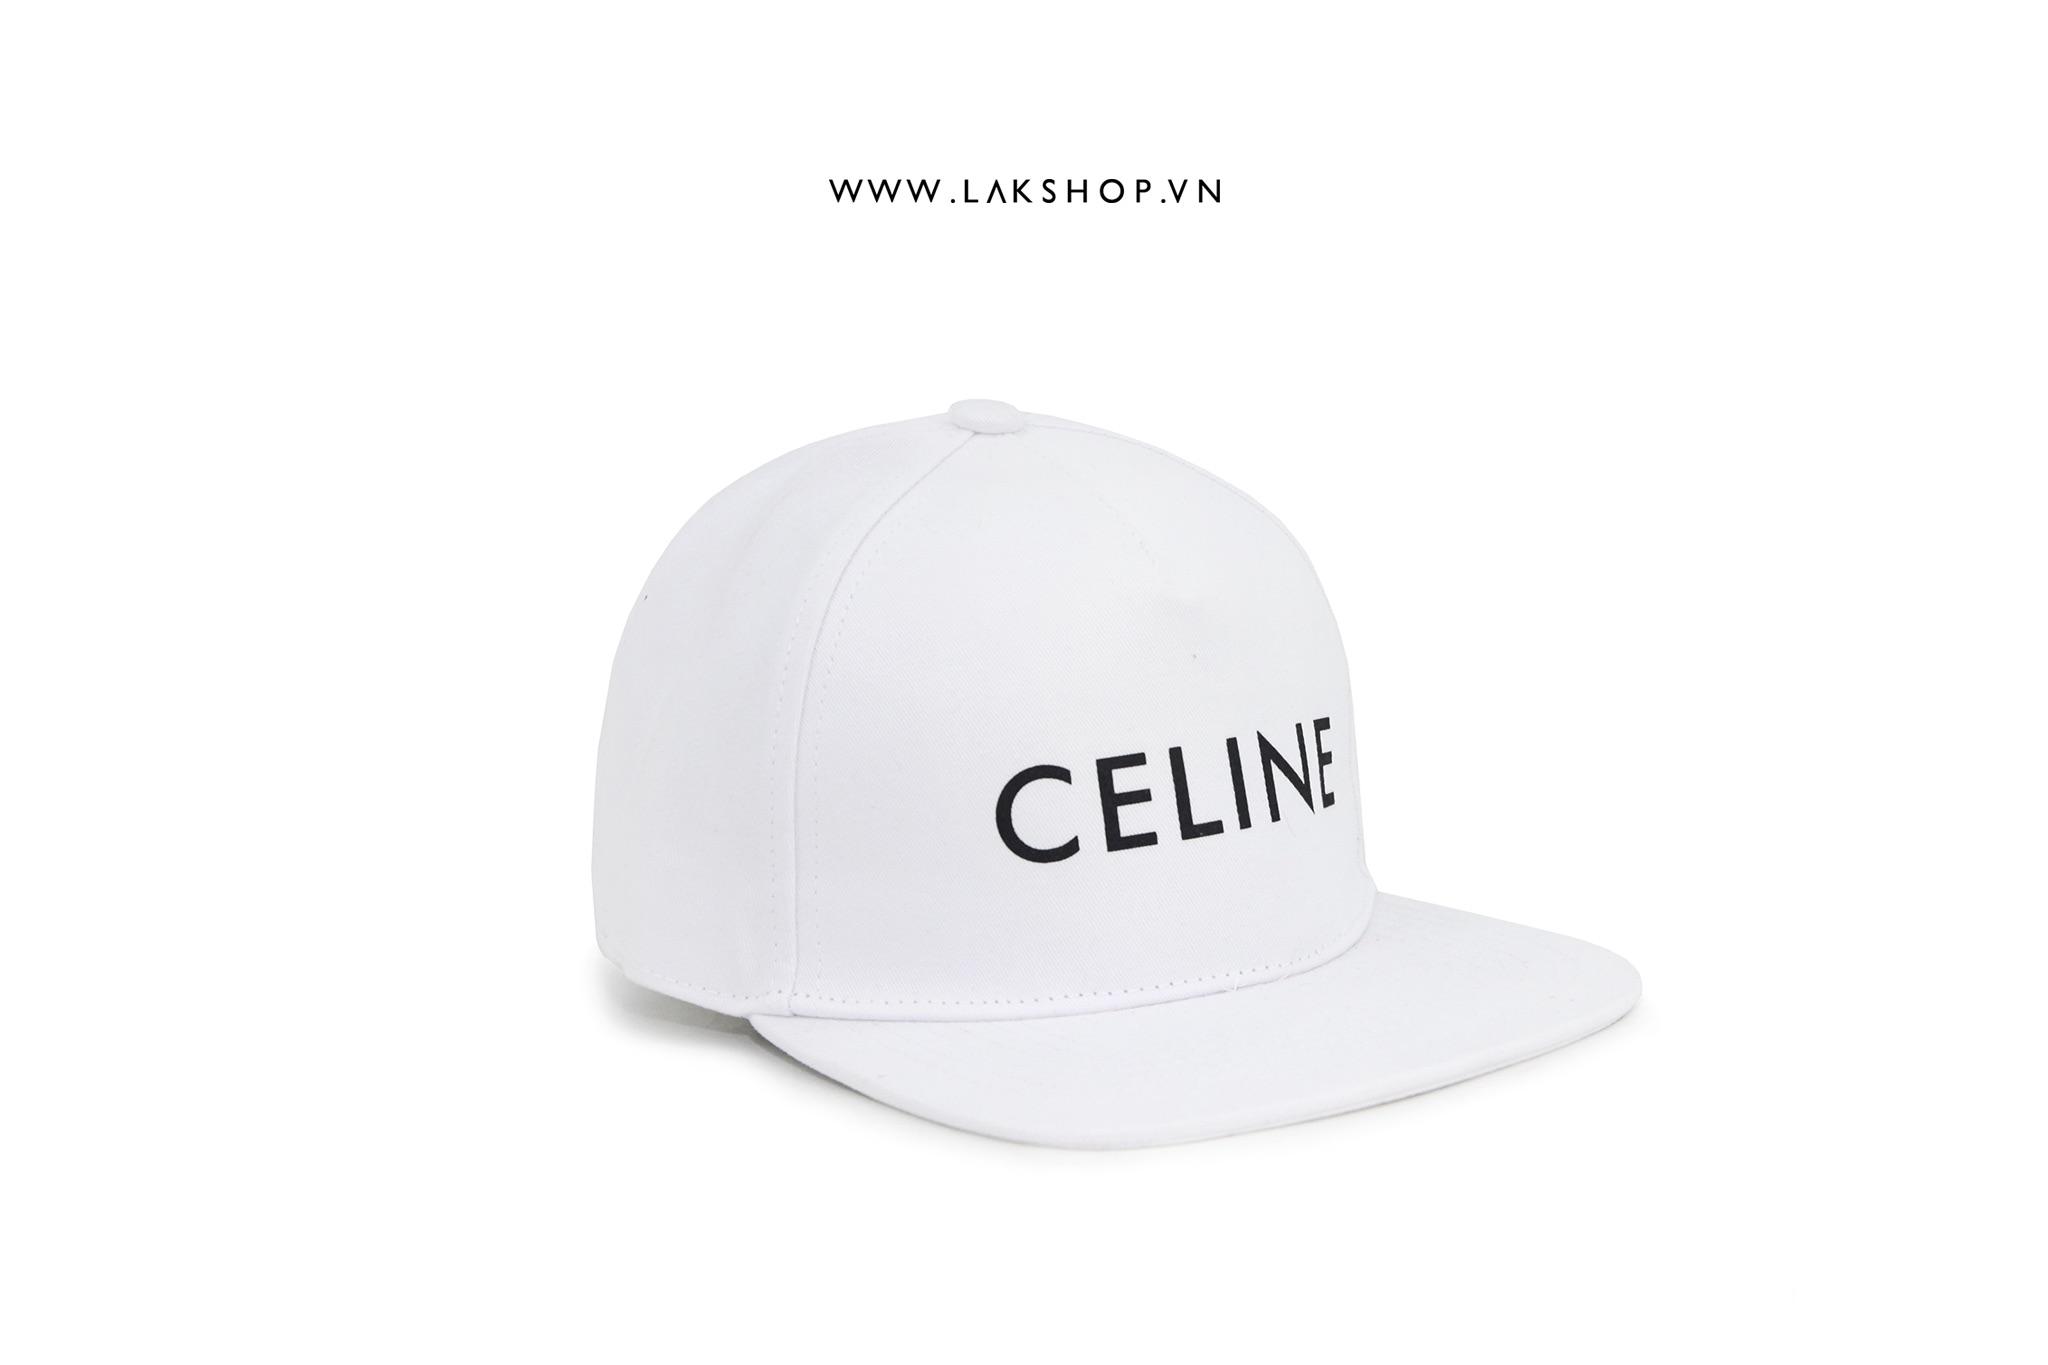 Celine Snapback Cotton White Cap